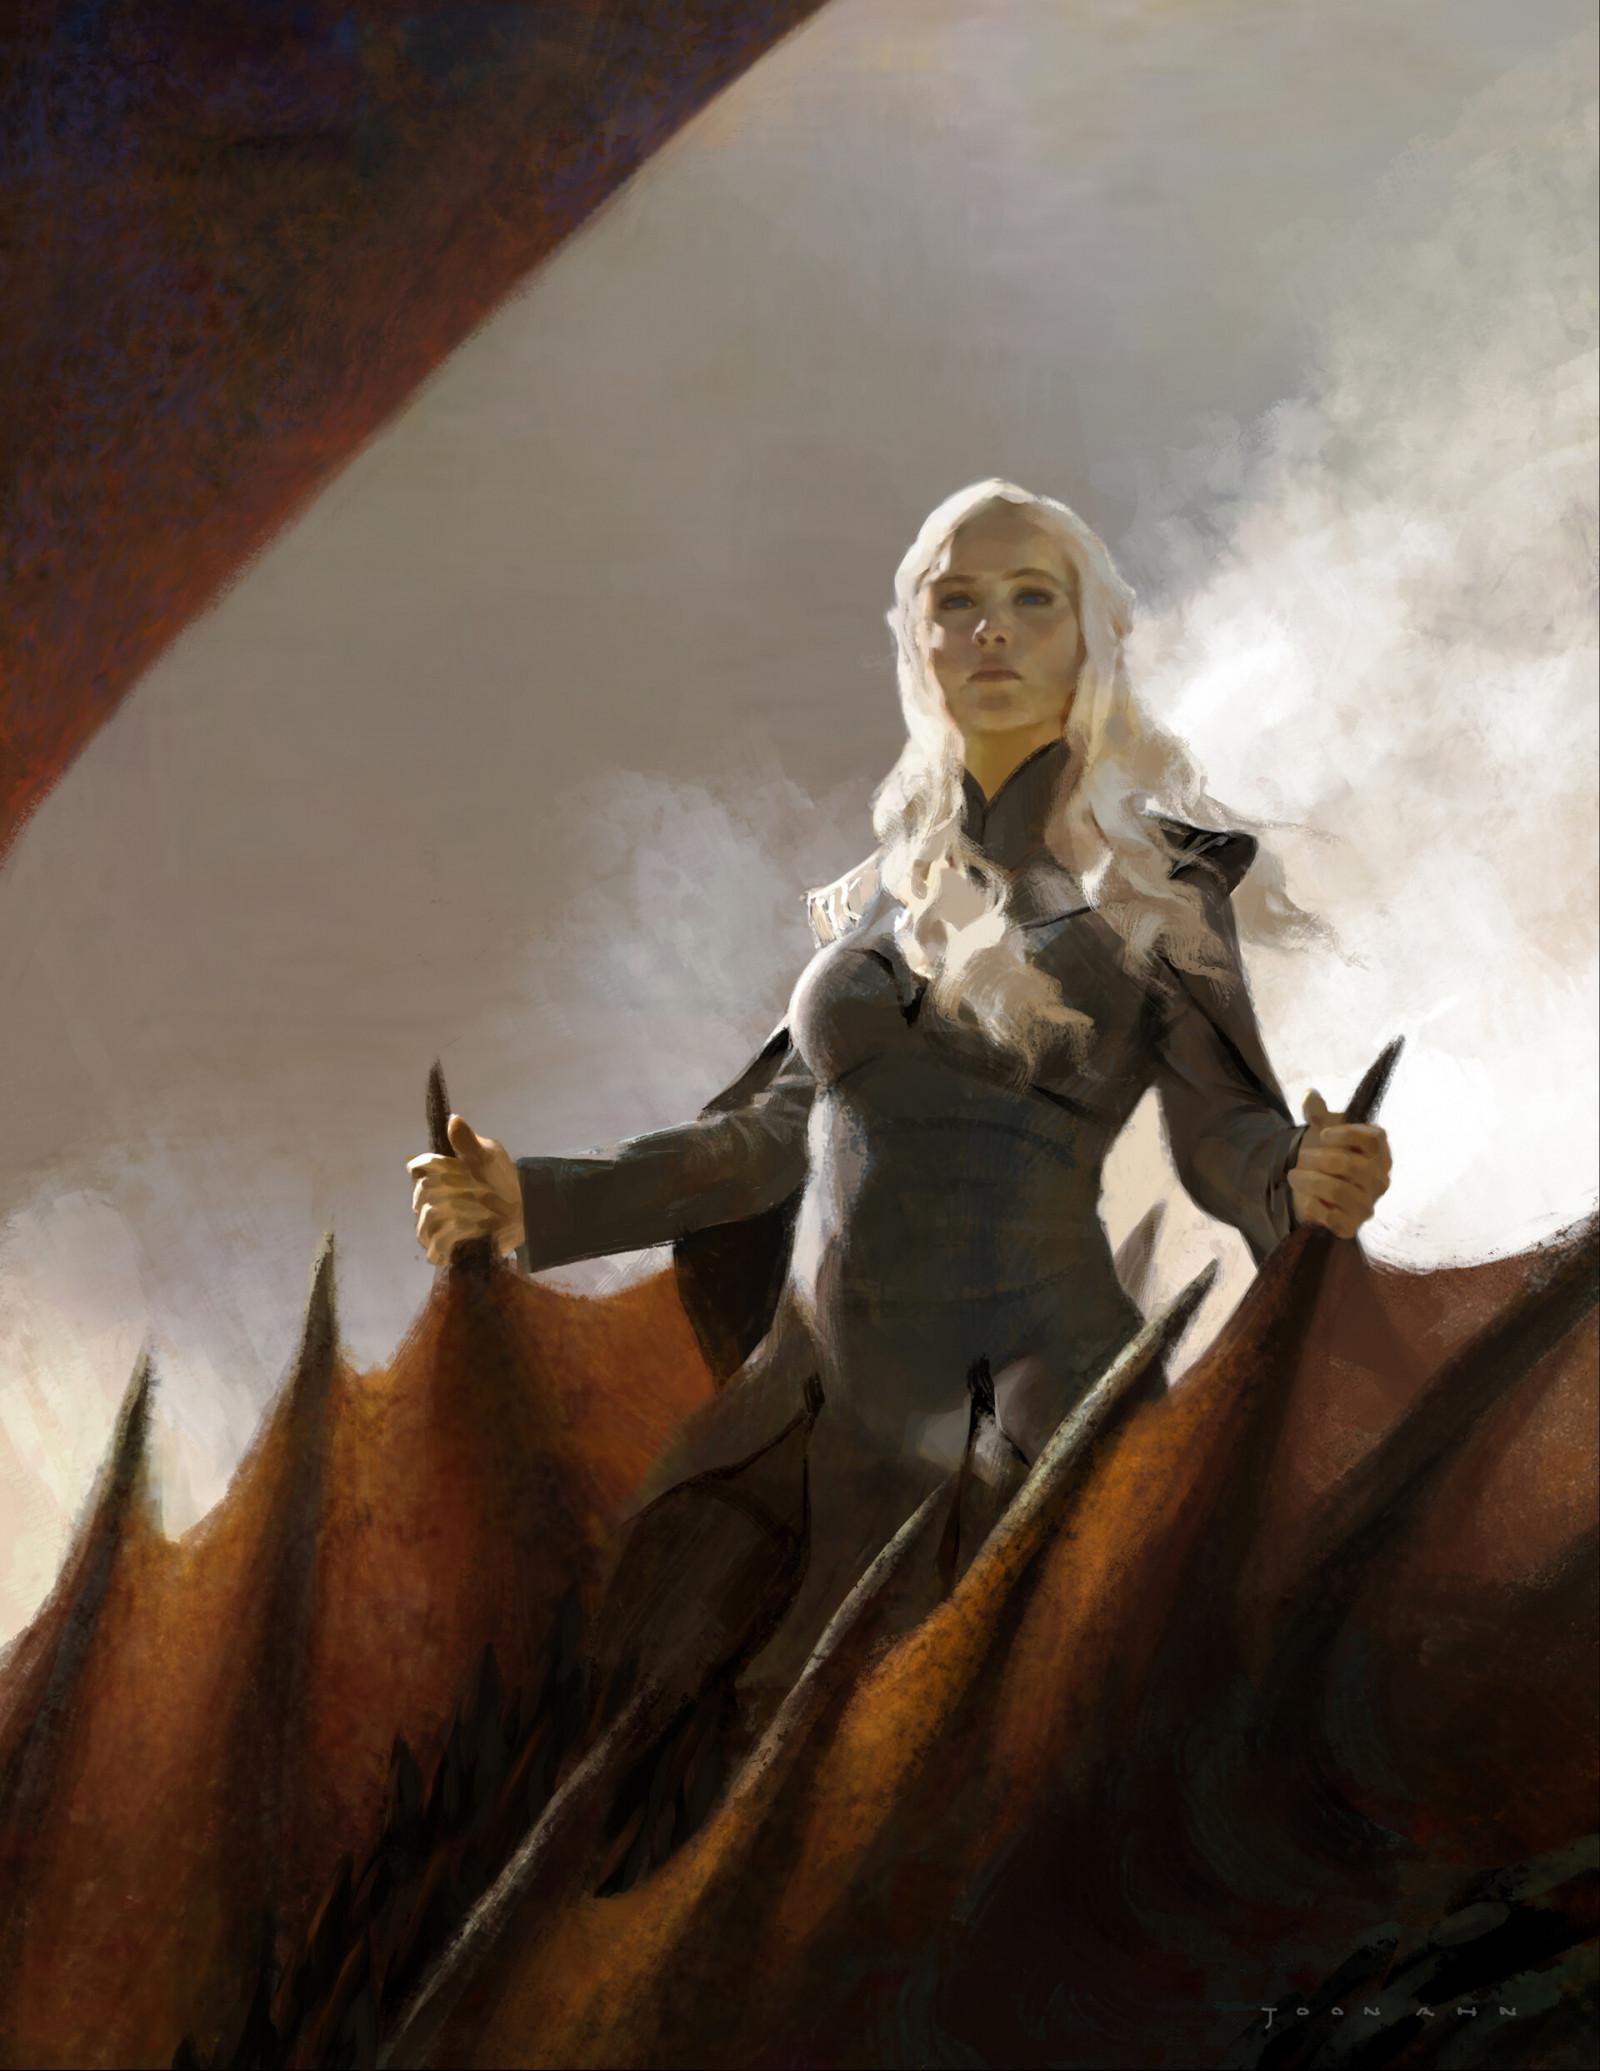 Wallpaper Daenerys Targaryen Game Of Thrones Fan Art Mother